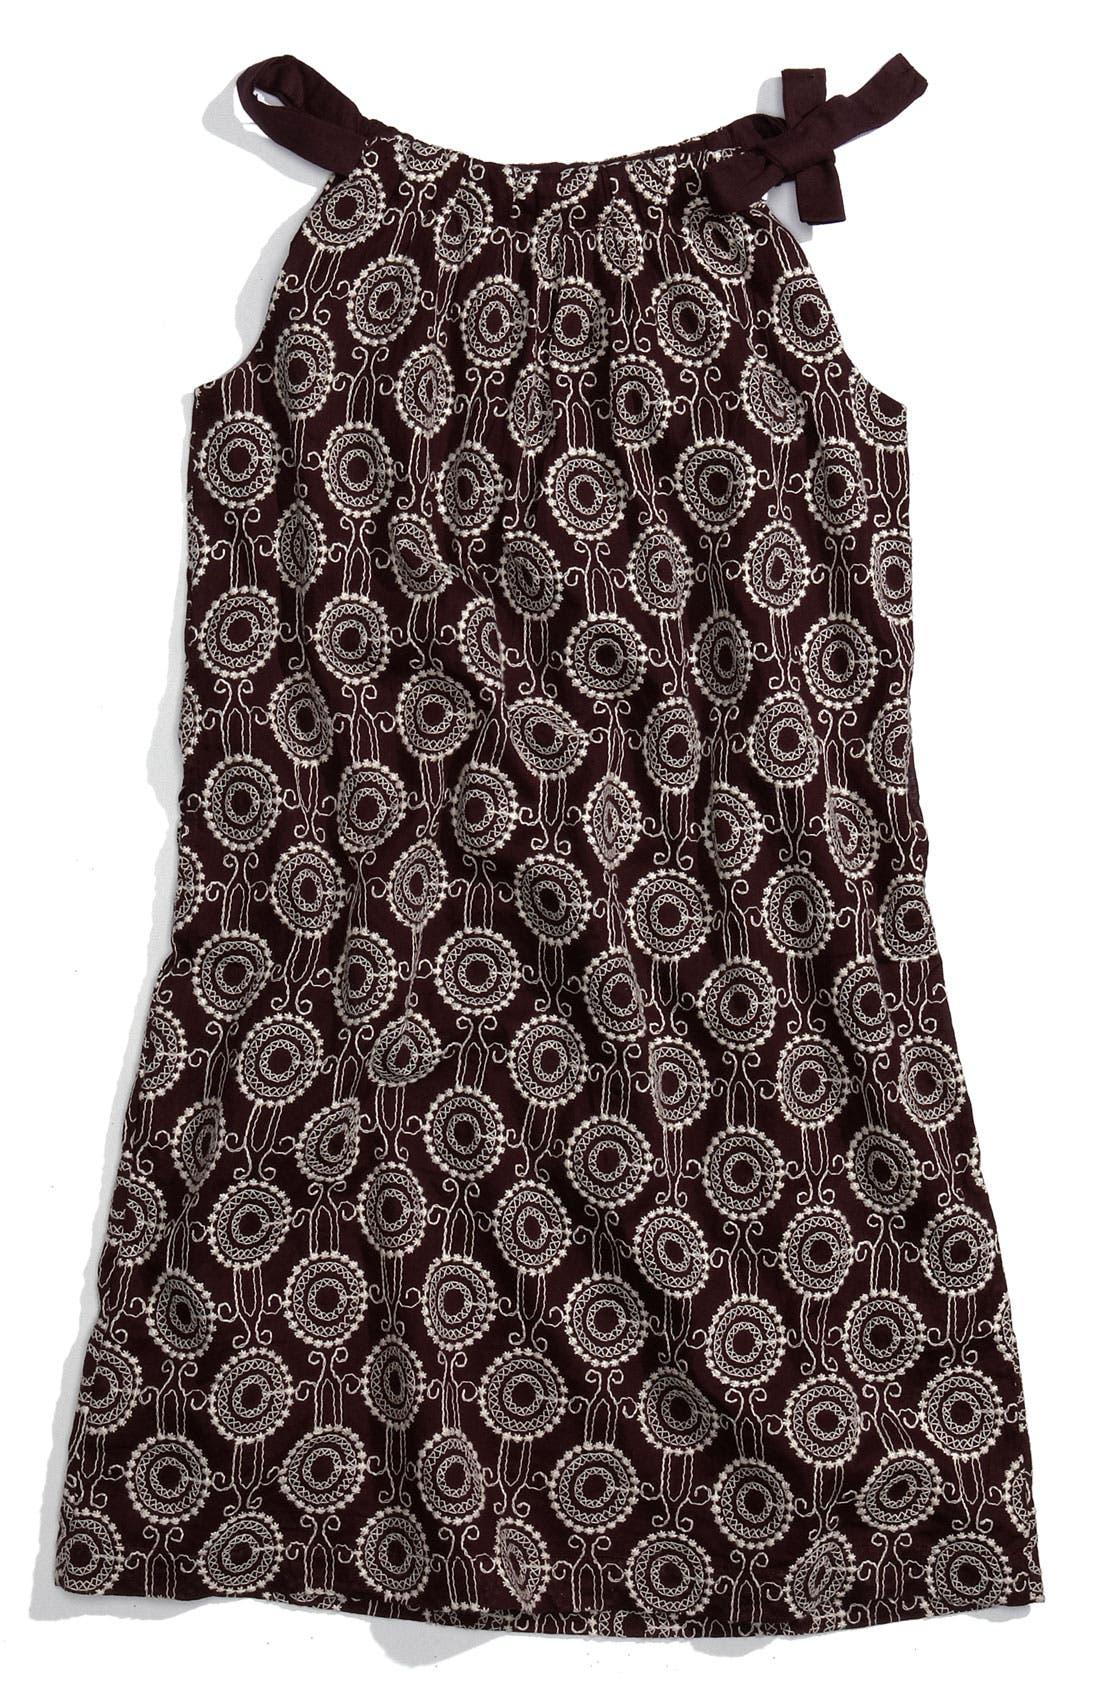 Alternate Image 1 Selected - Peek Embroidered Dress (Toddler, Little Girl & Big Girl)